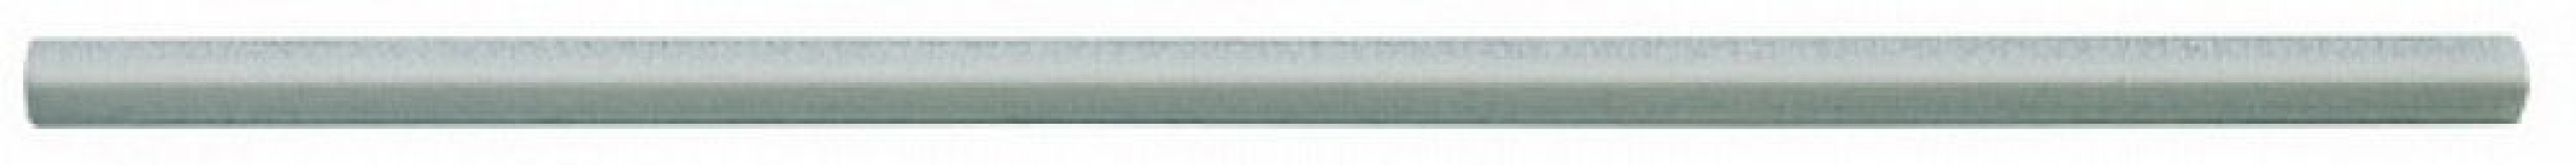 Бордюр Ocean ADOC5092 Bullnose Trim Top Sail 0.85x22.5 Adex